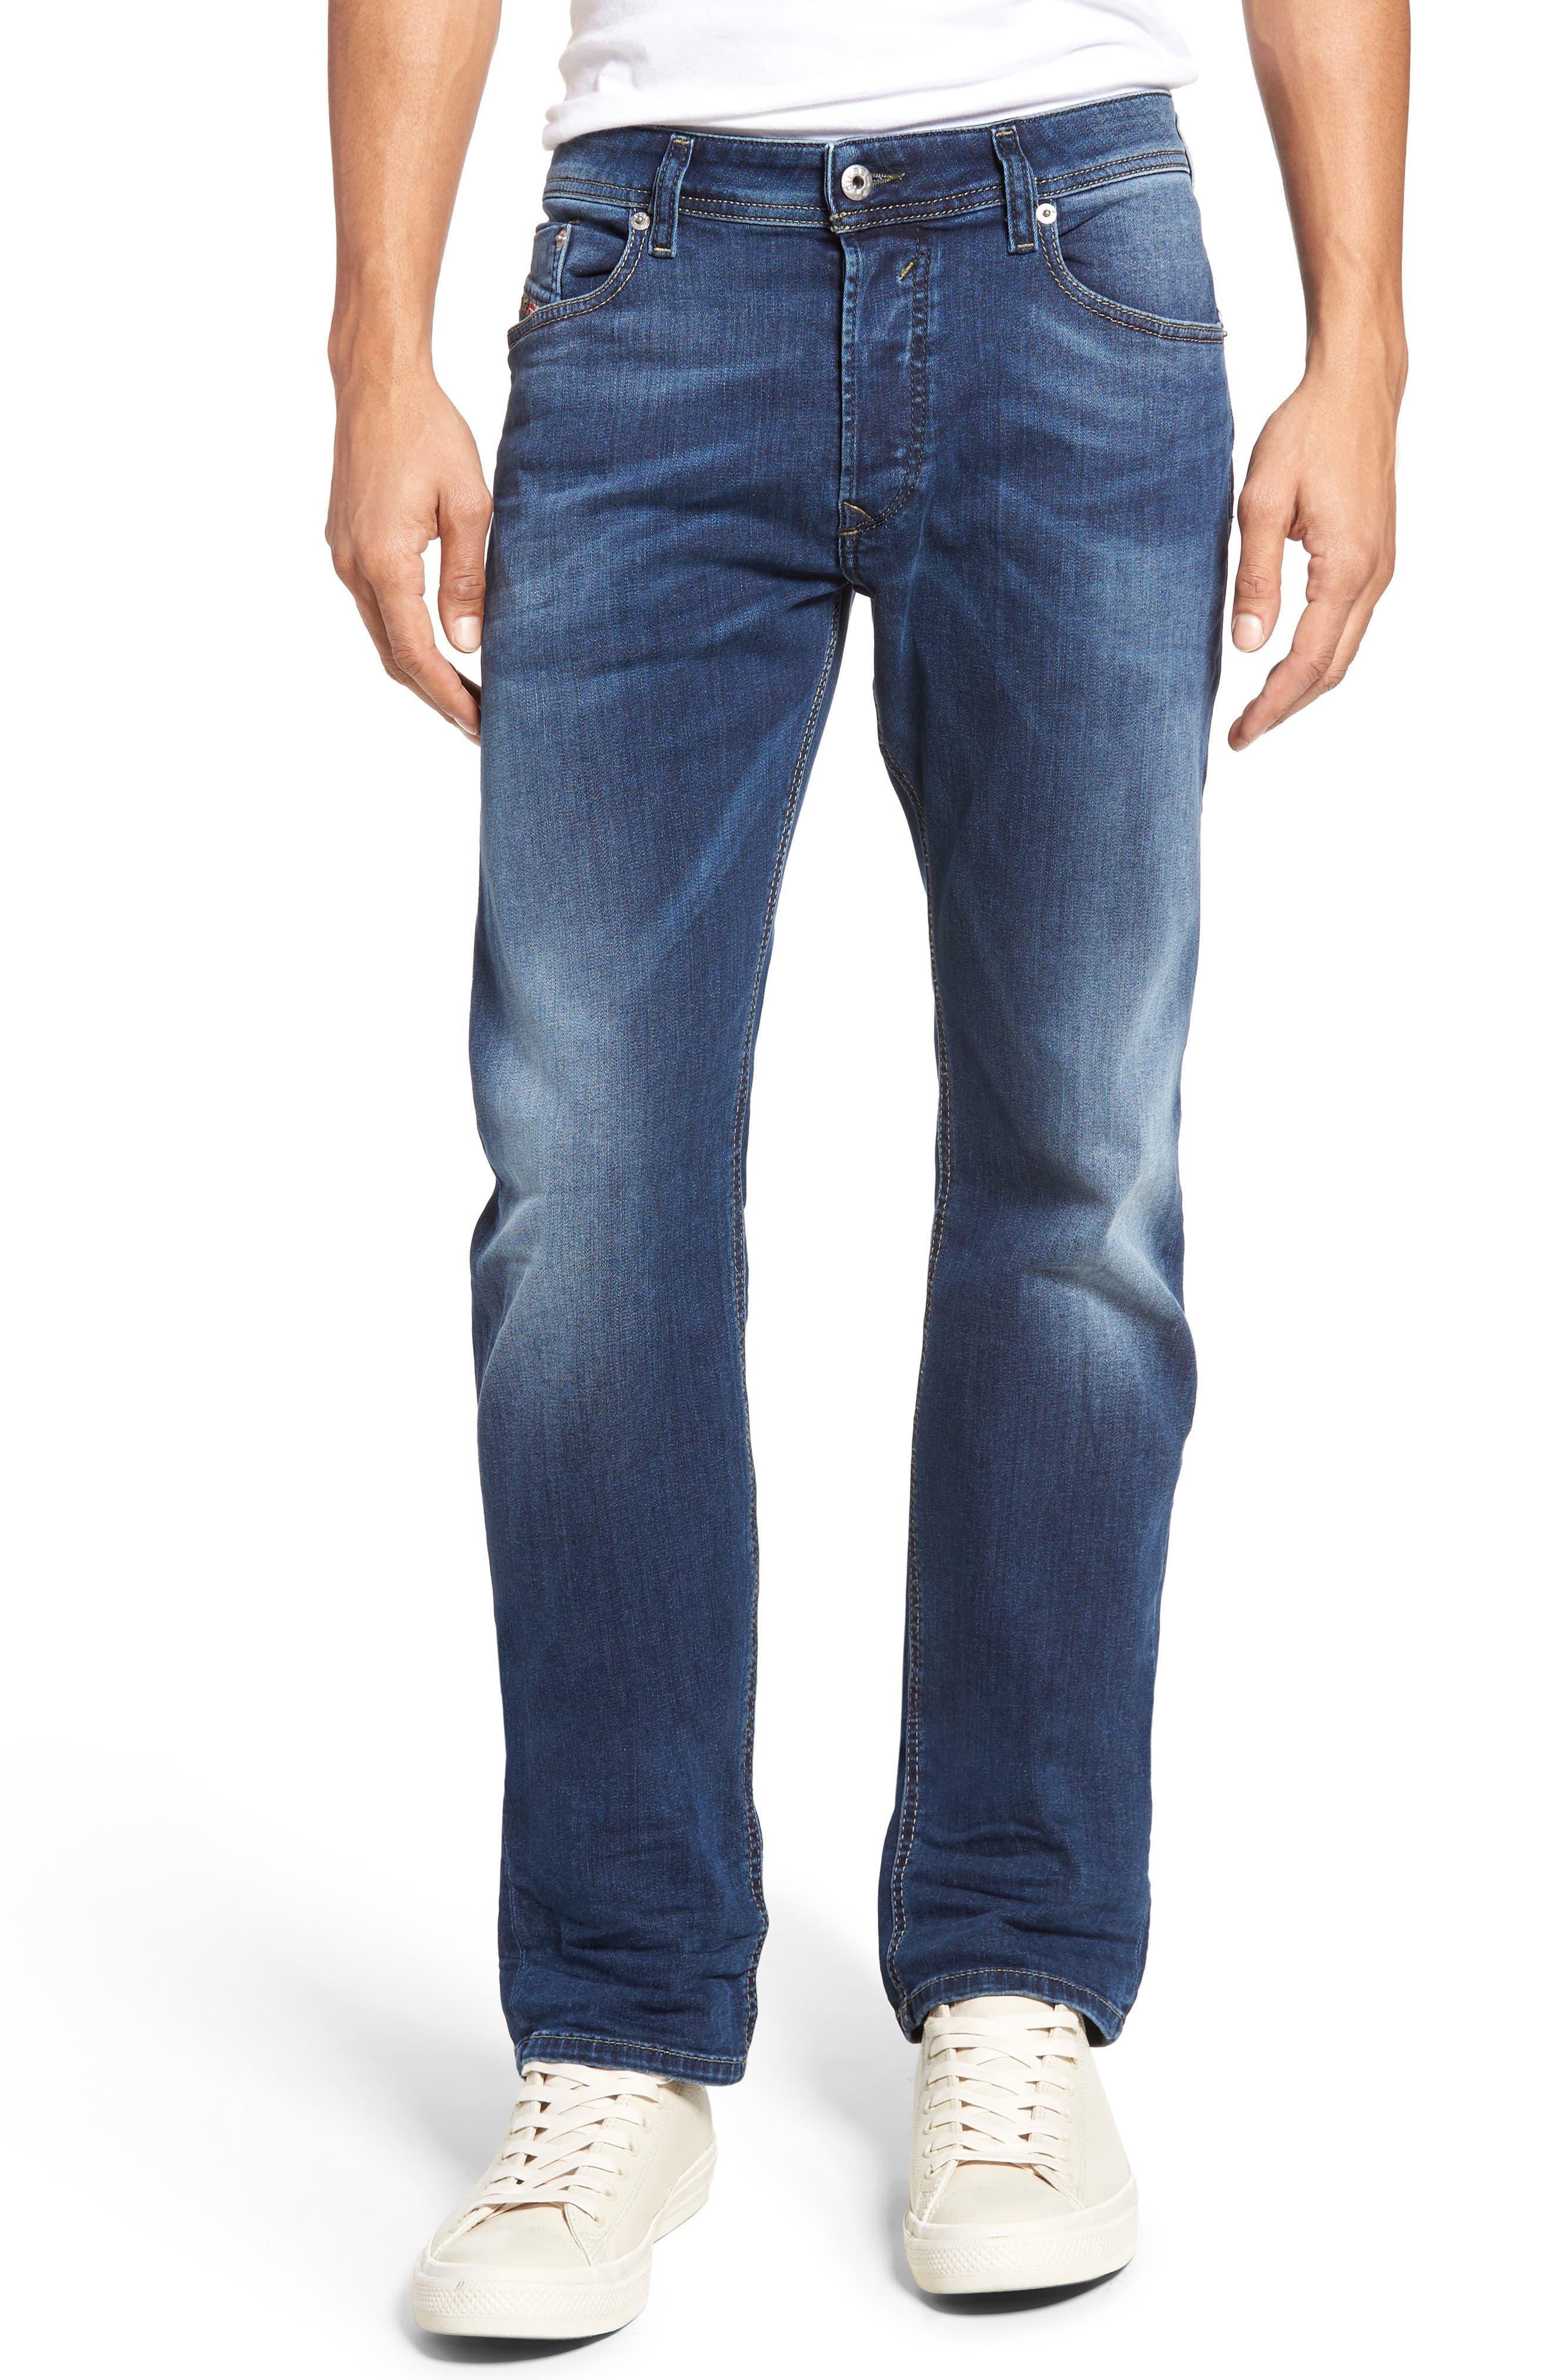 Waykee Straight Leg Jeans,                             Main thumbnail 1, color,                             0679I